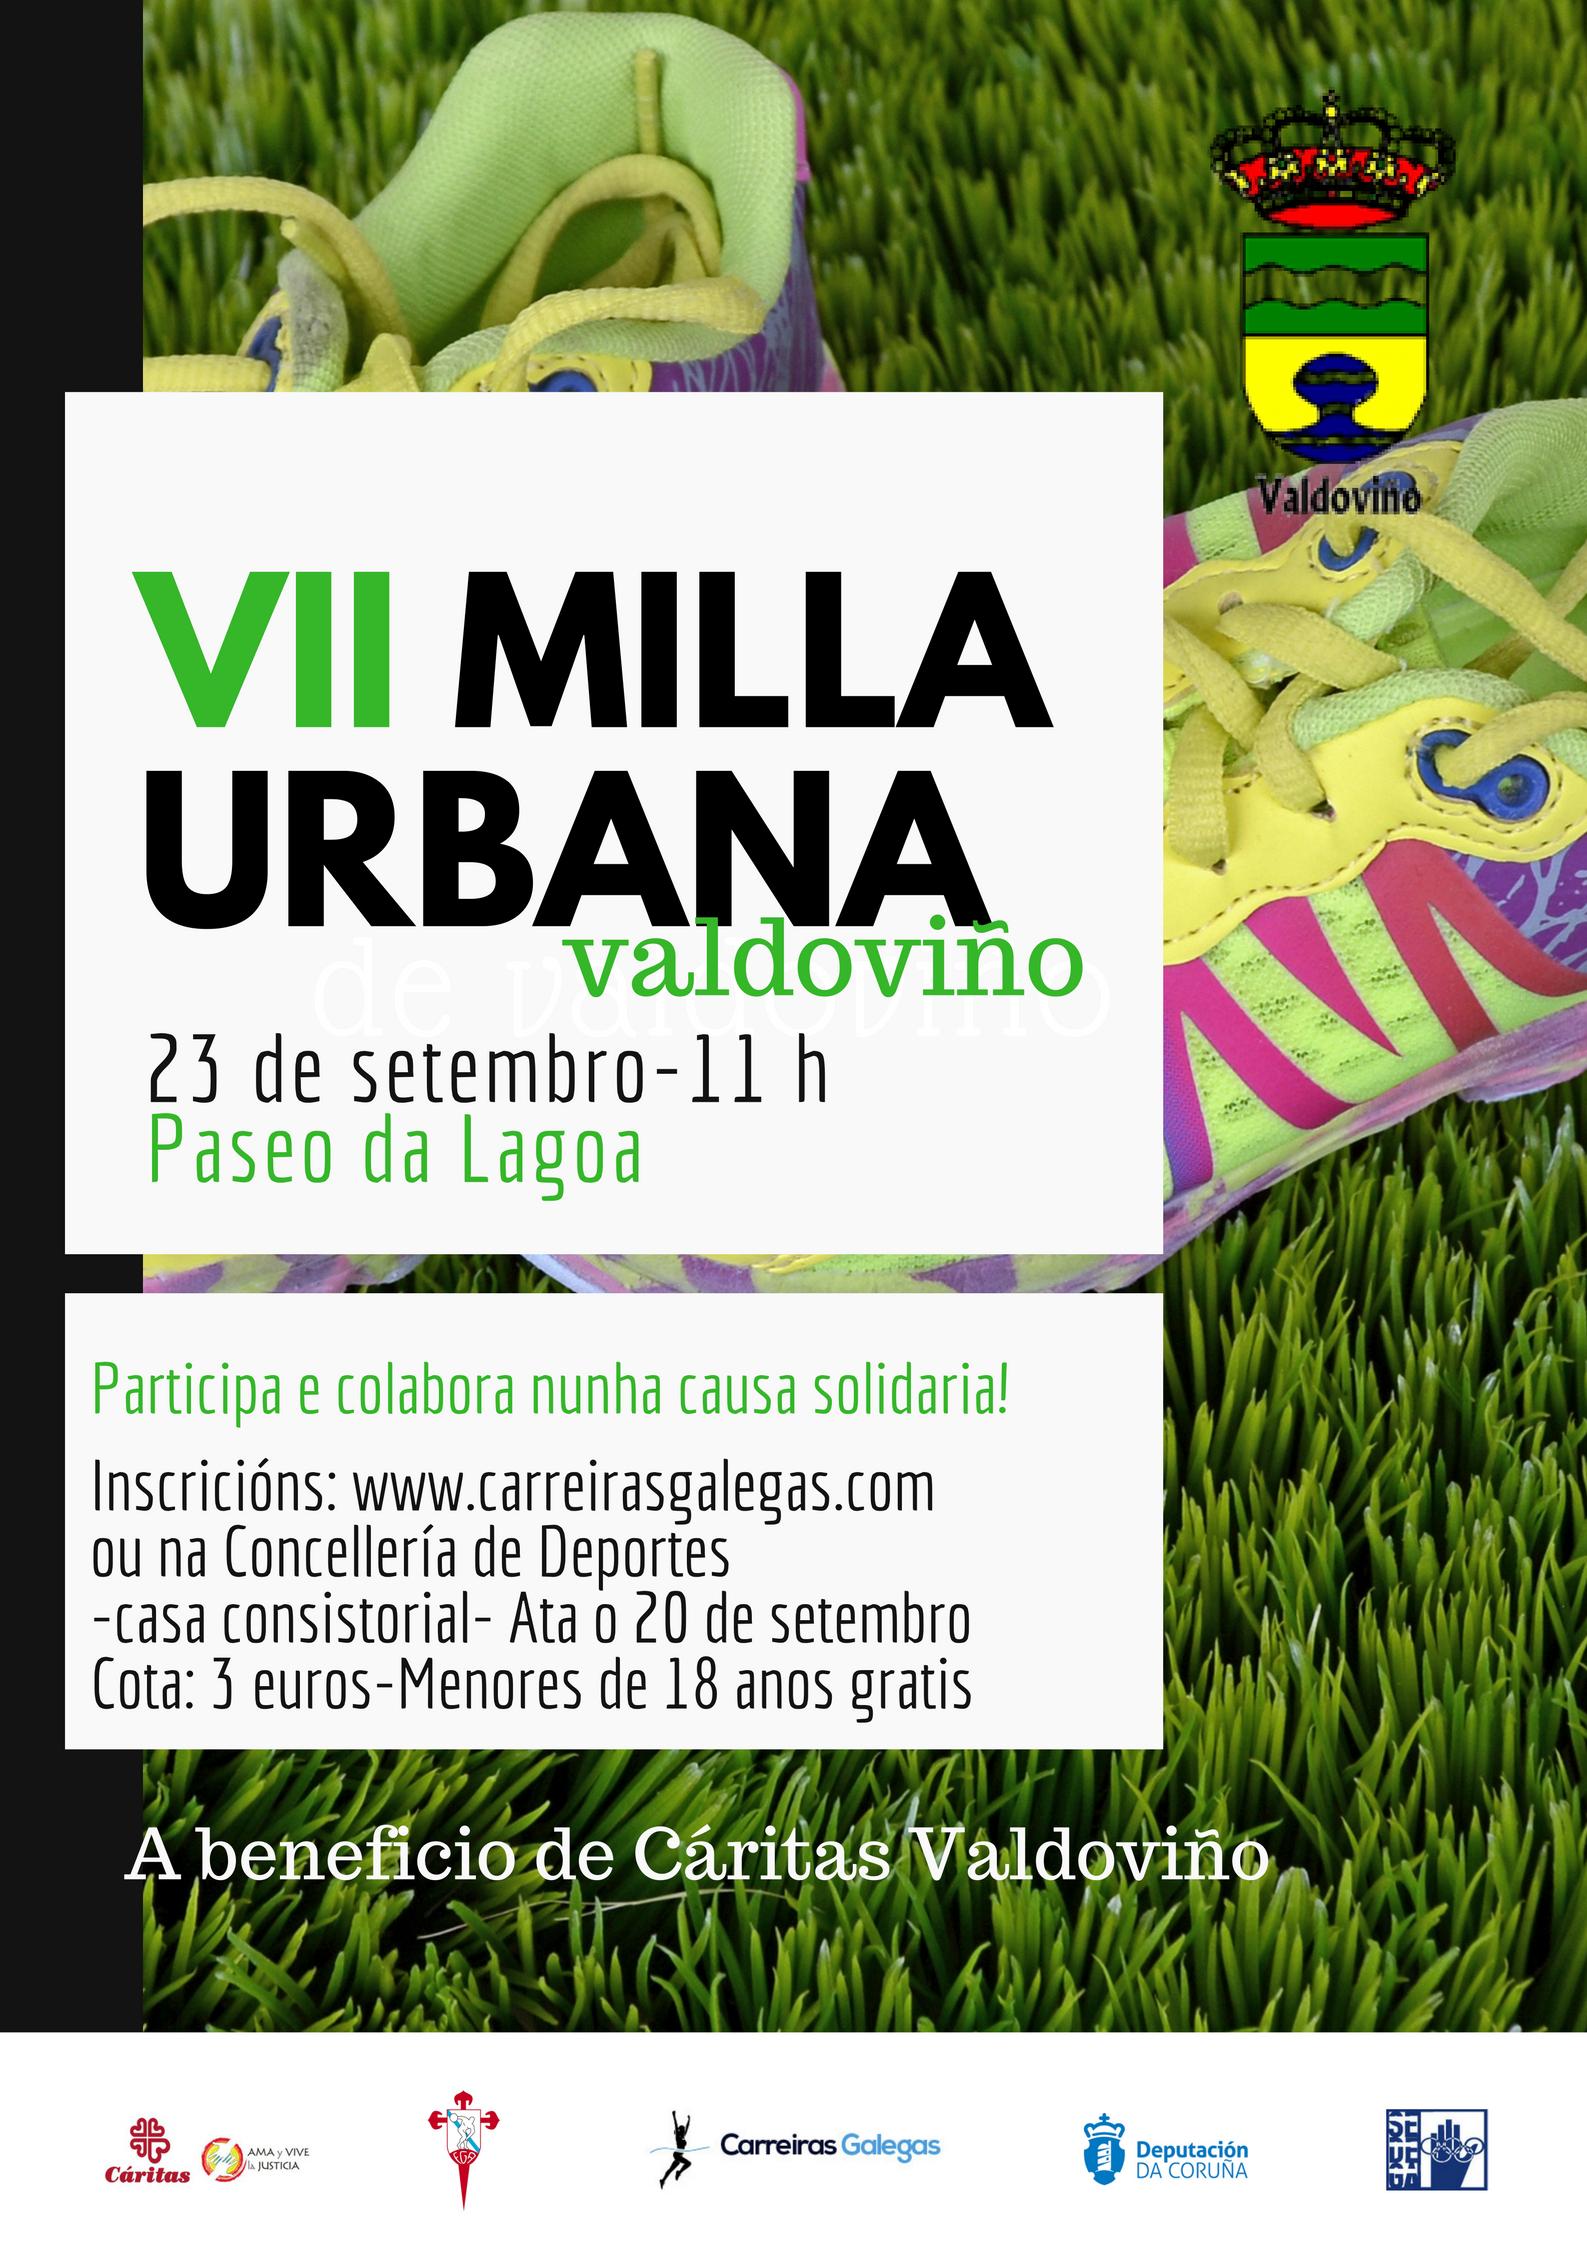 VII Milla Urbana Concello de Valdoviño